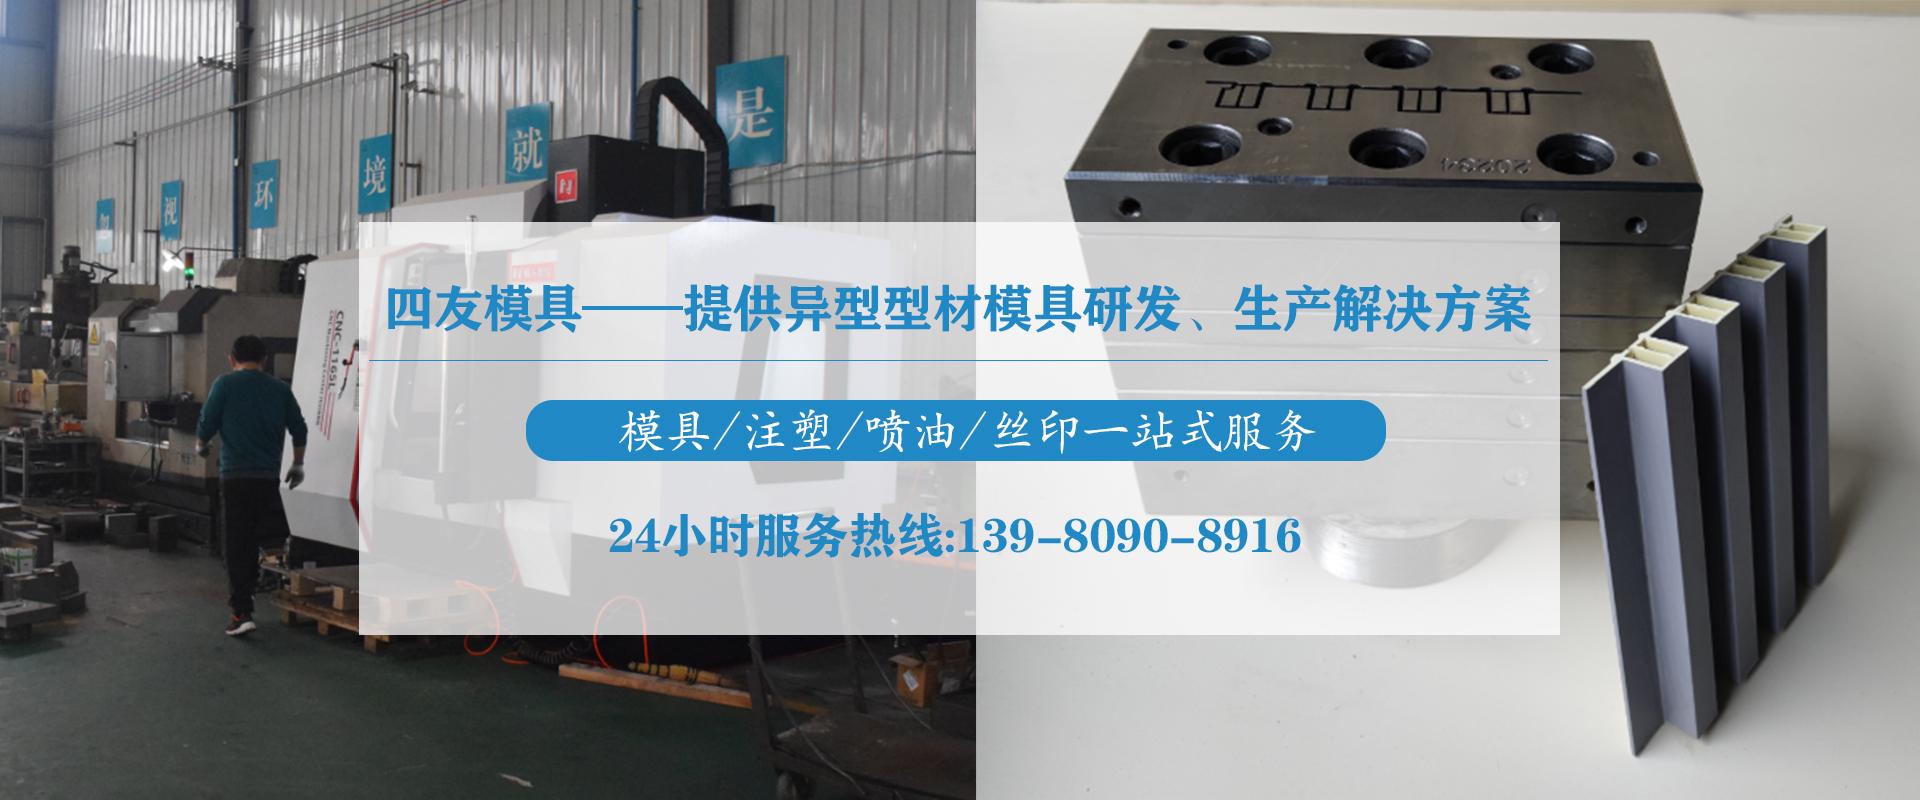 http://www.cdsymj.cn/data/upload/202101/20210119100717_183.jpg